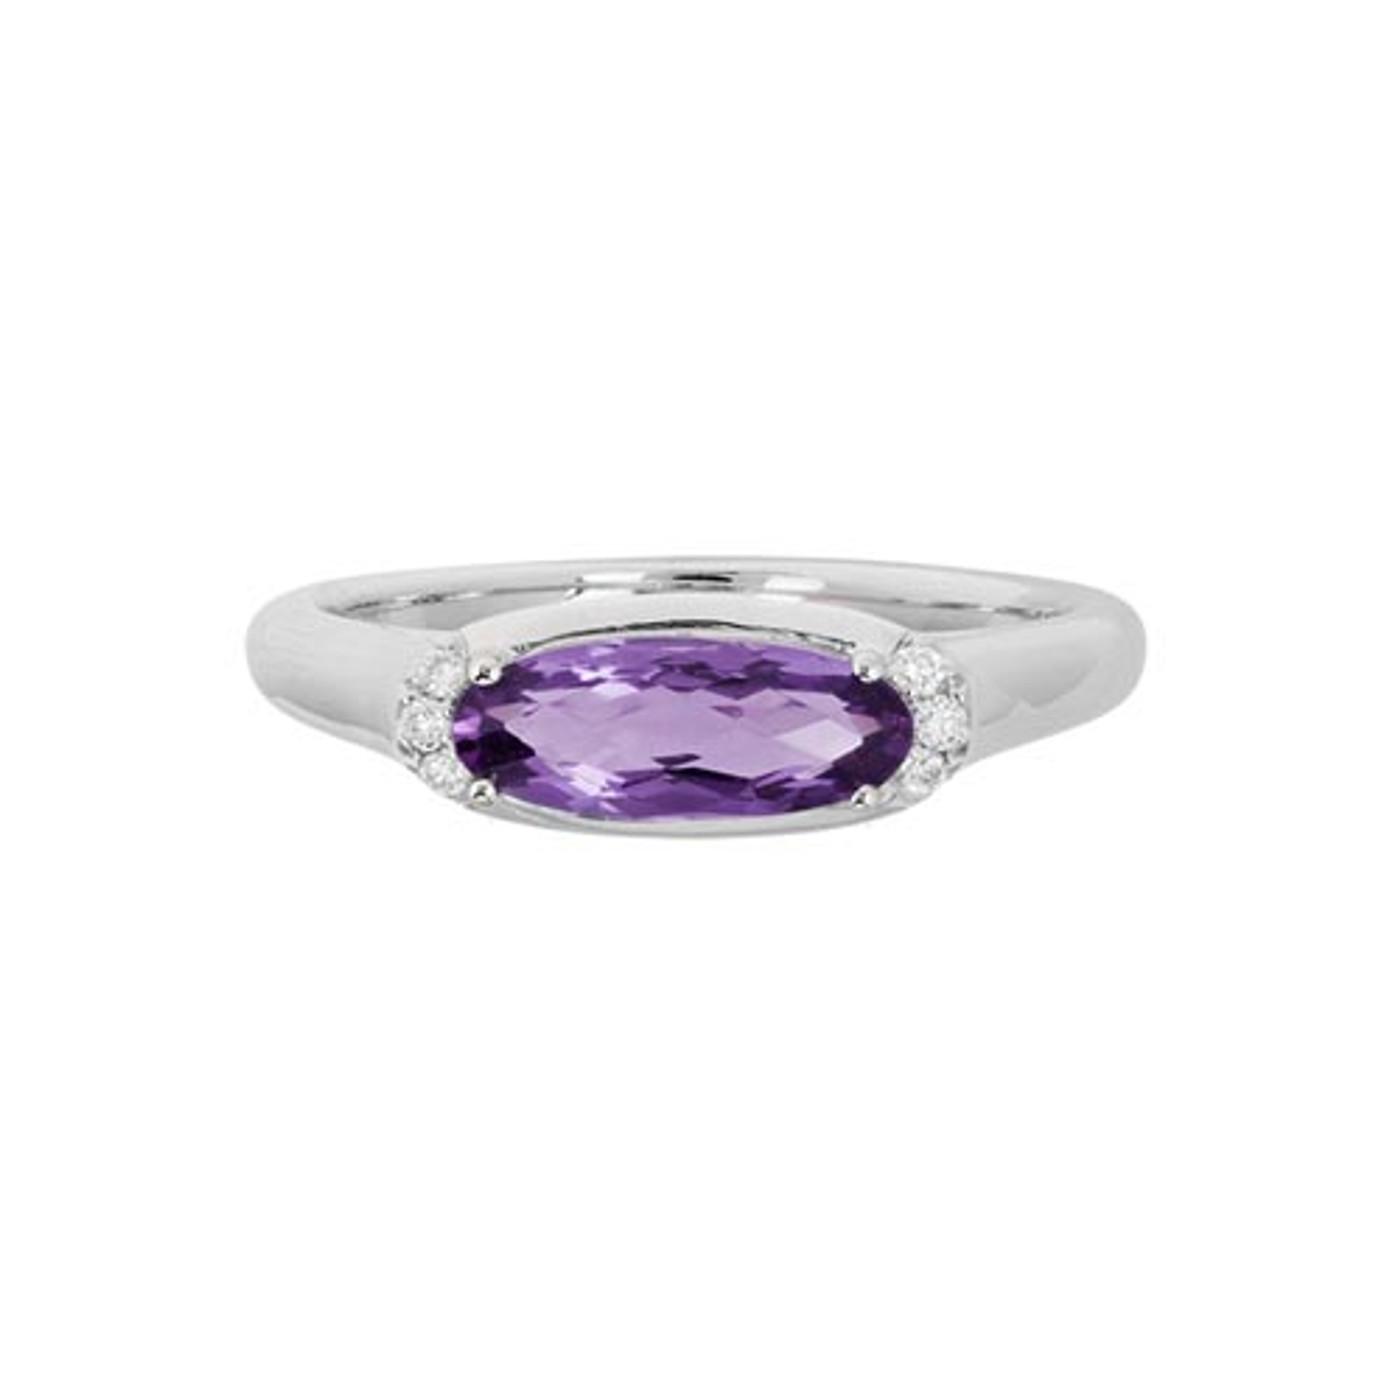 14 Karat White Gold Oval Amethyst & Diamond Ring